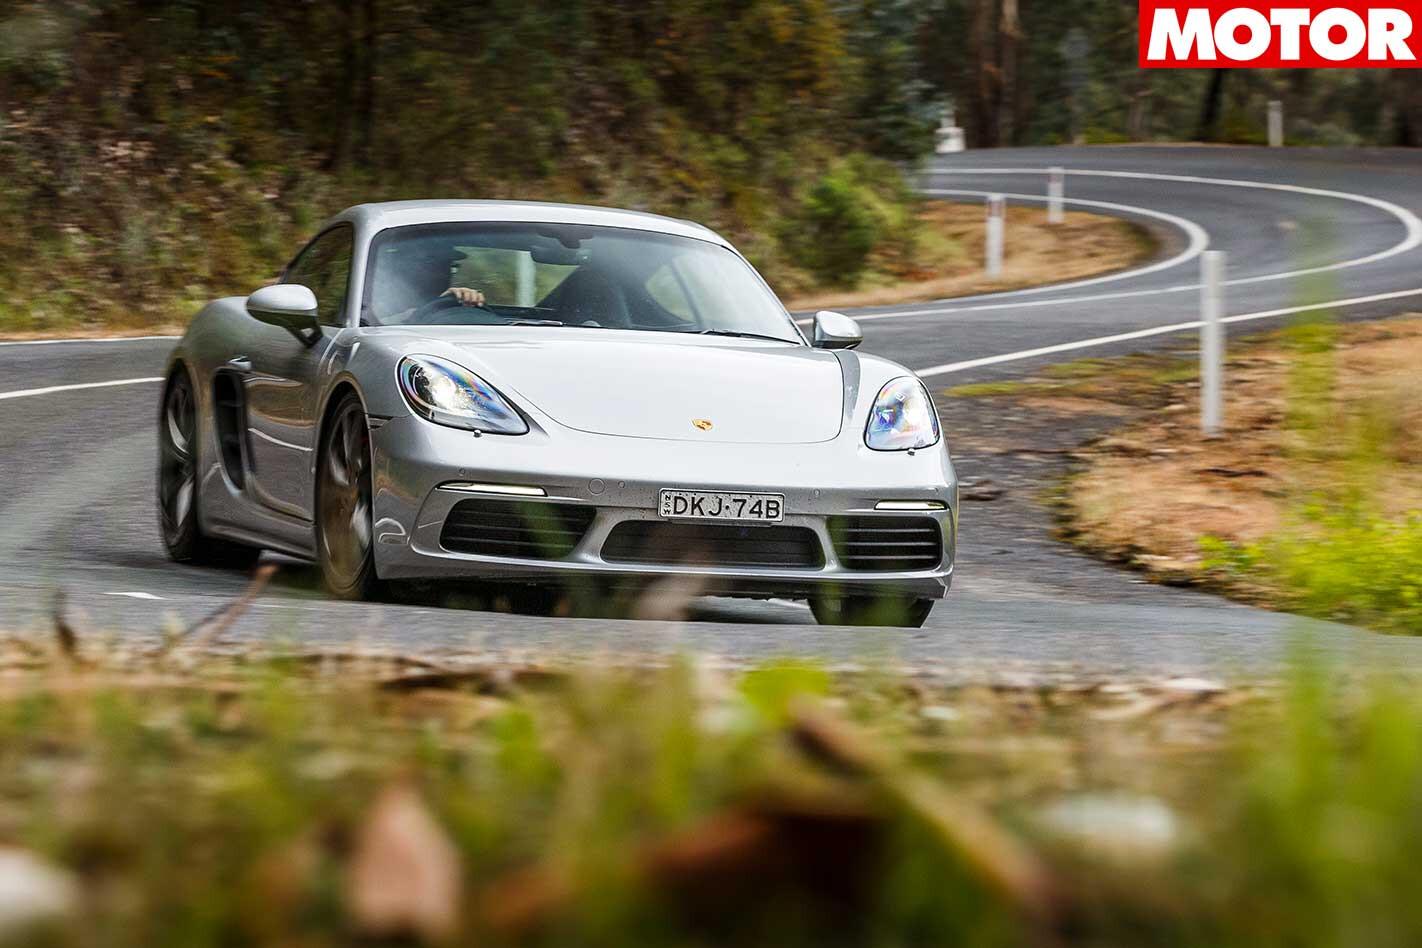 Porsche 718 Cayman S Features